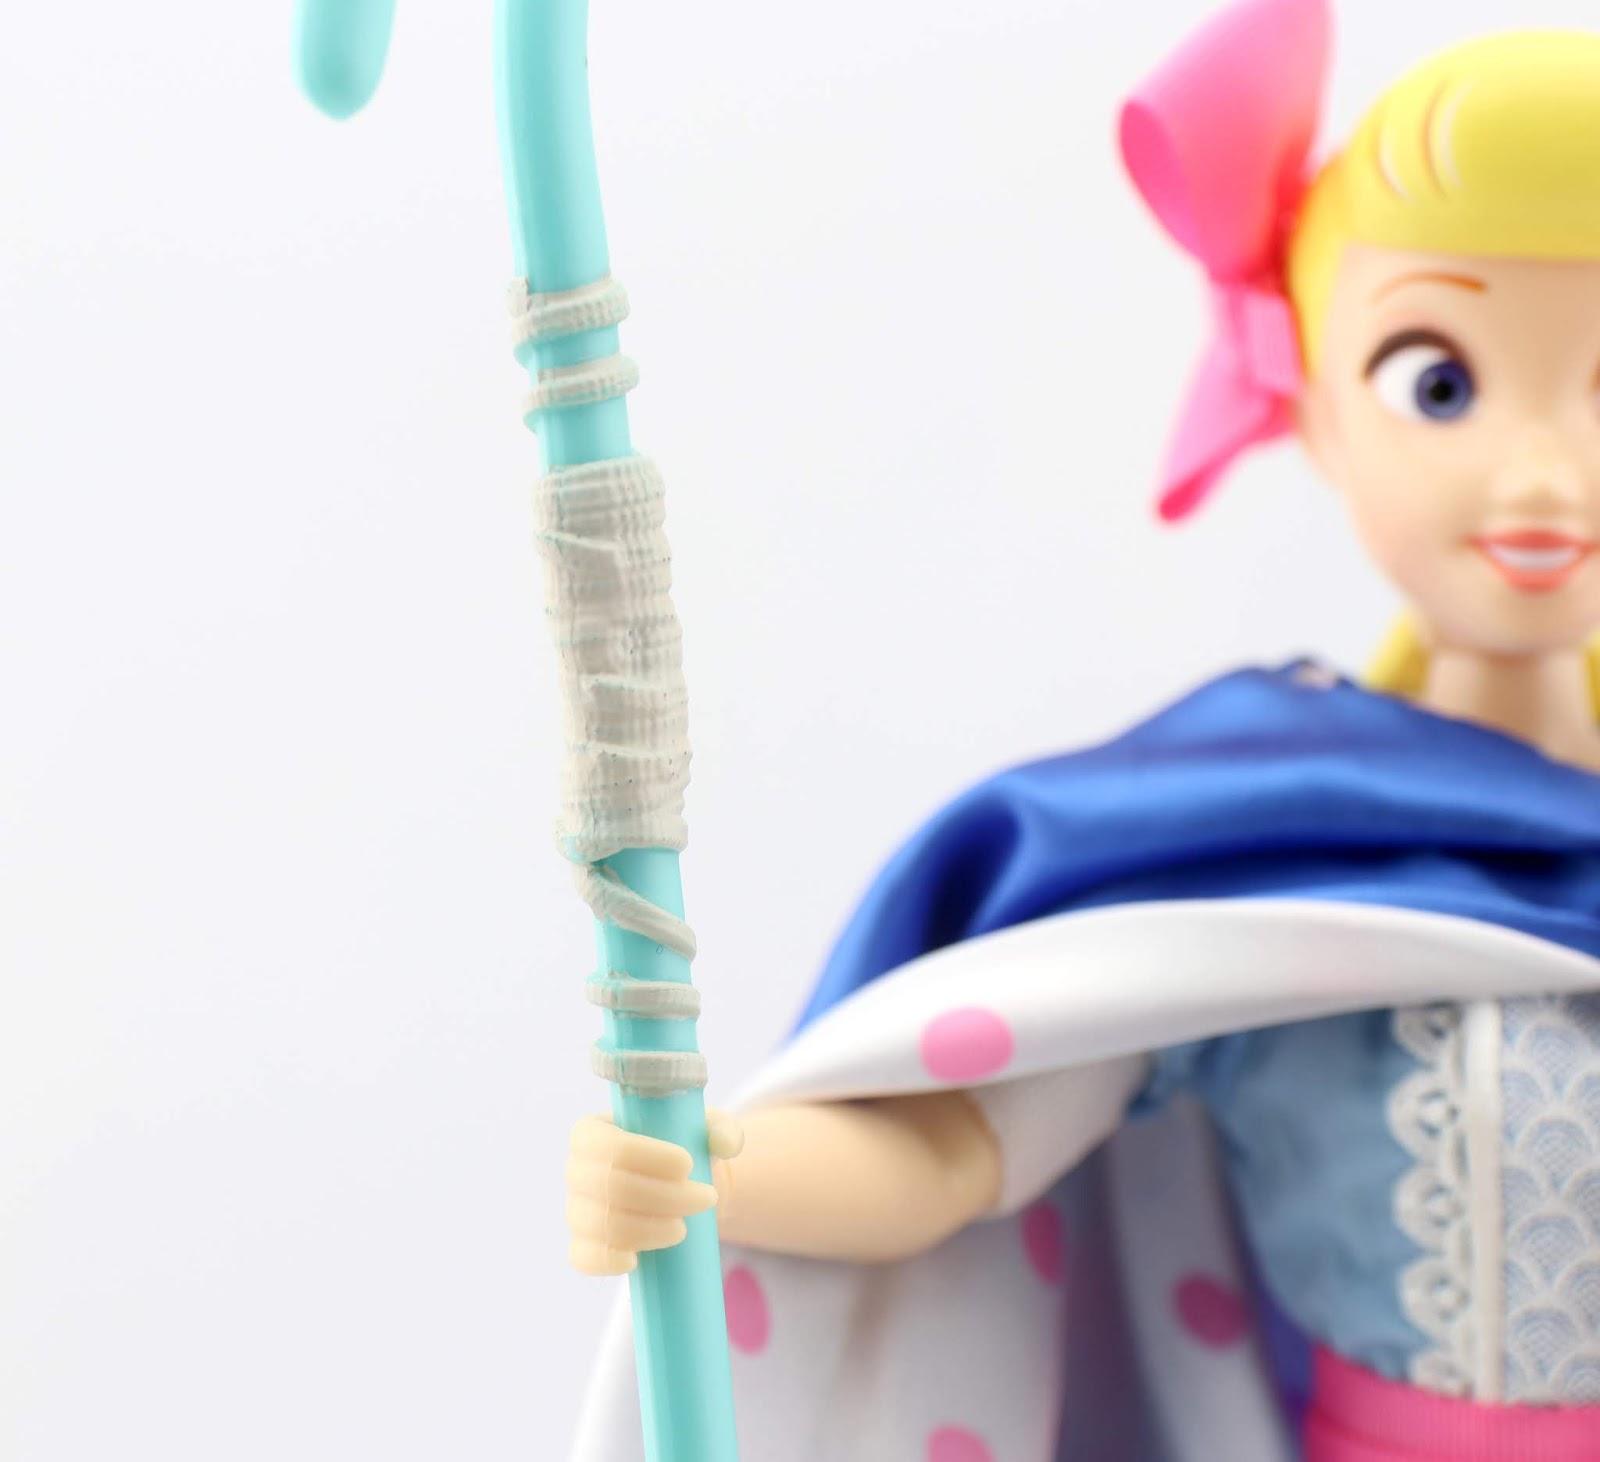 disney store toy story 4 bo peep talking action figure